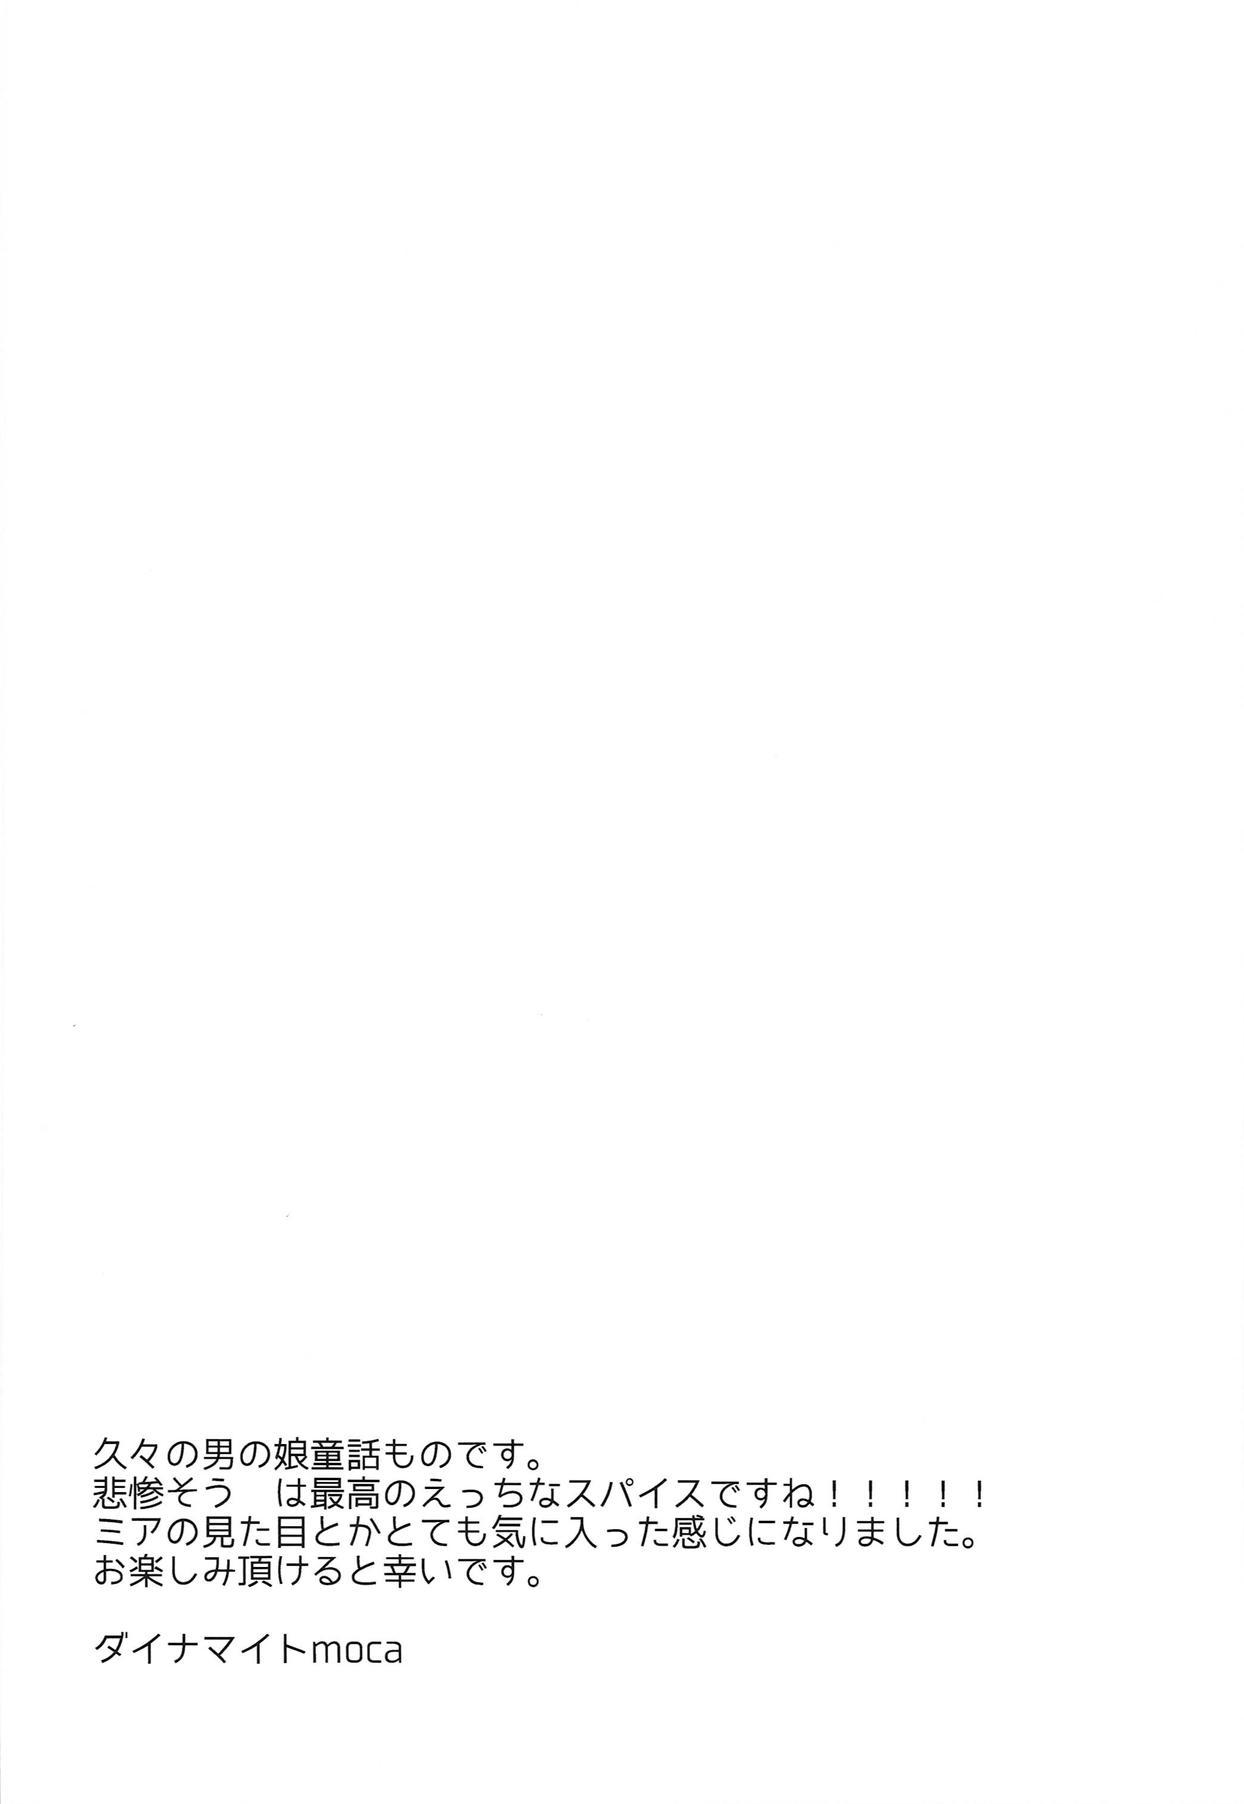 Match Uri no Otokonoko to Kime-seku! | Let's Drug and Fuck the Little Match Trap! 3